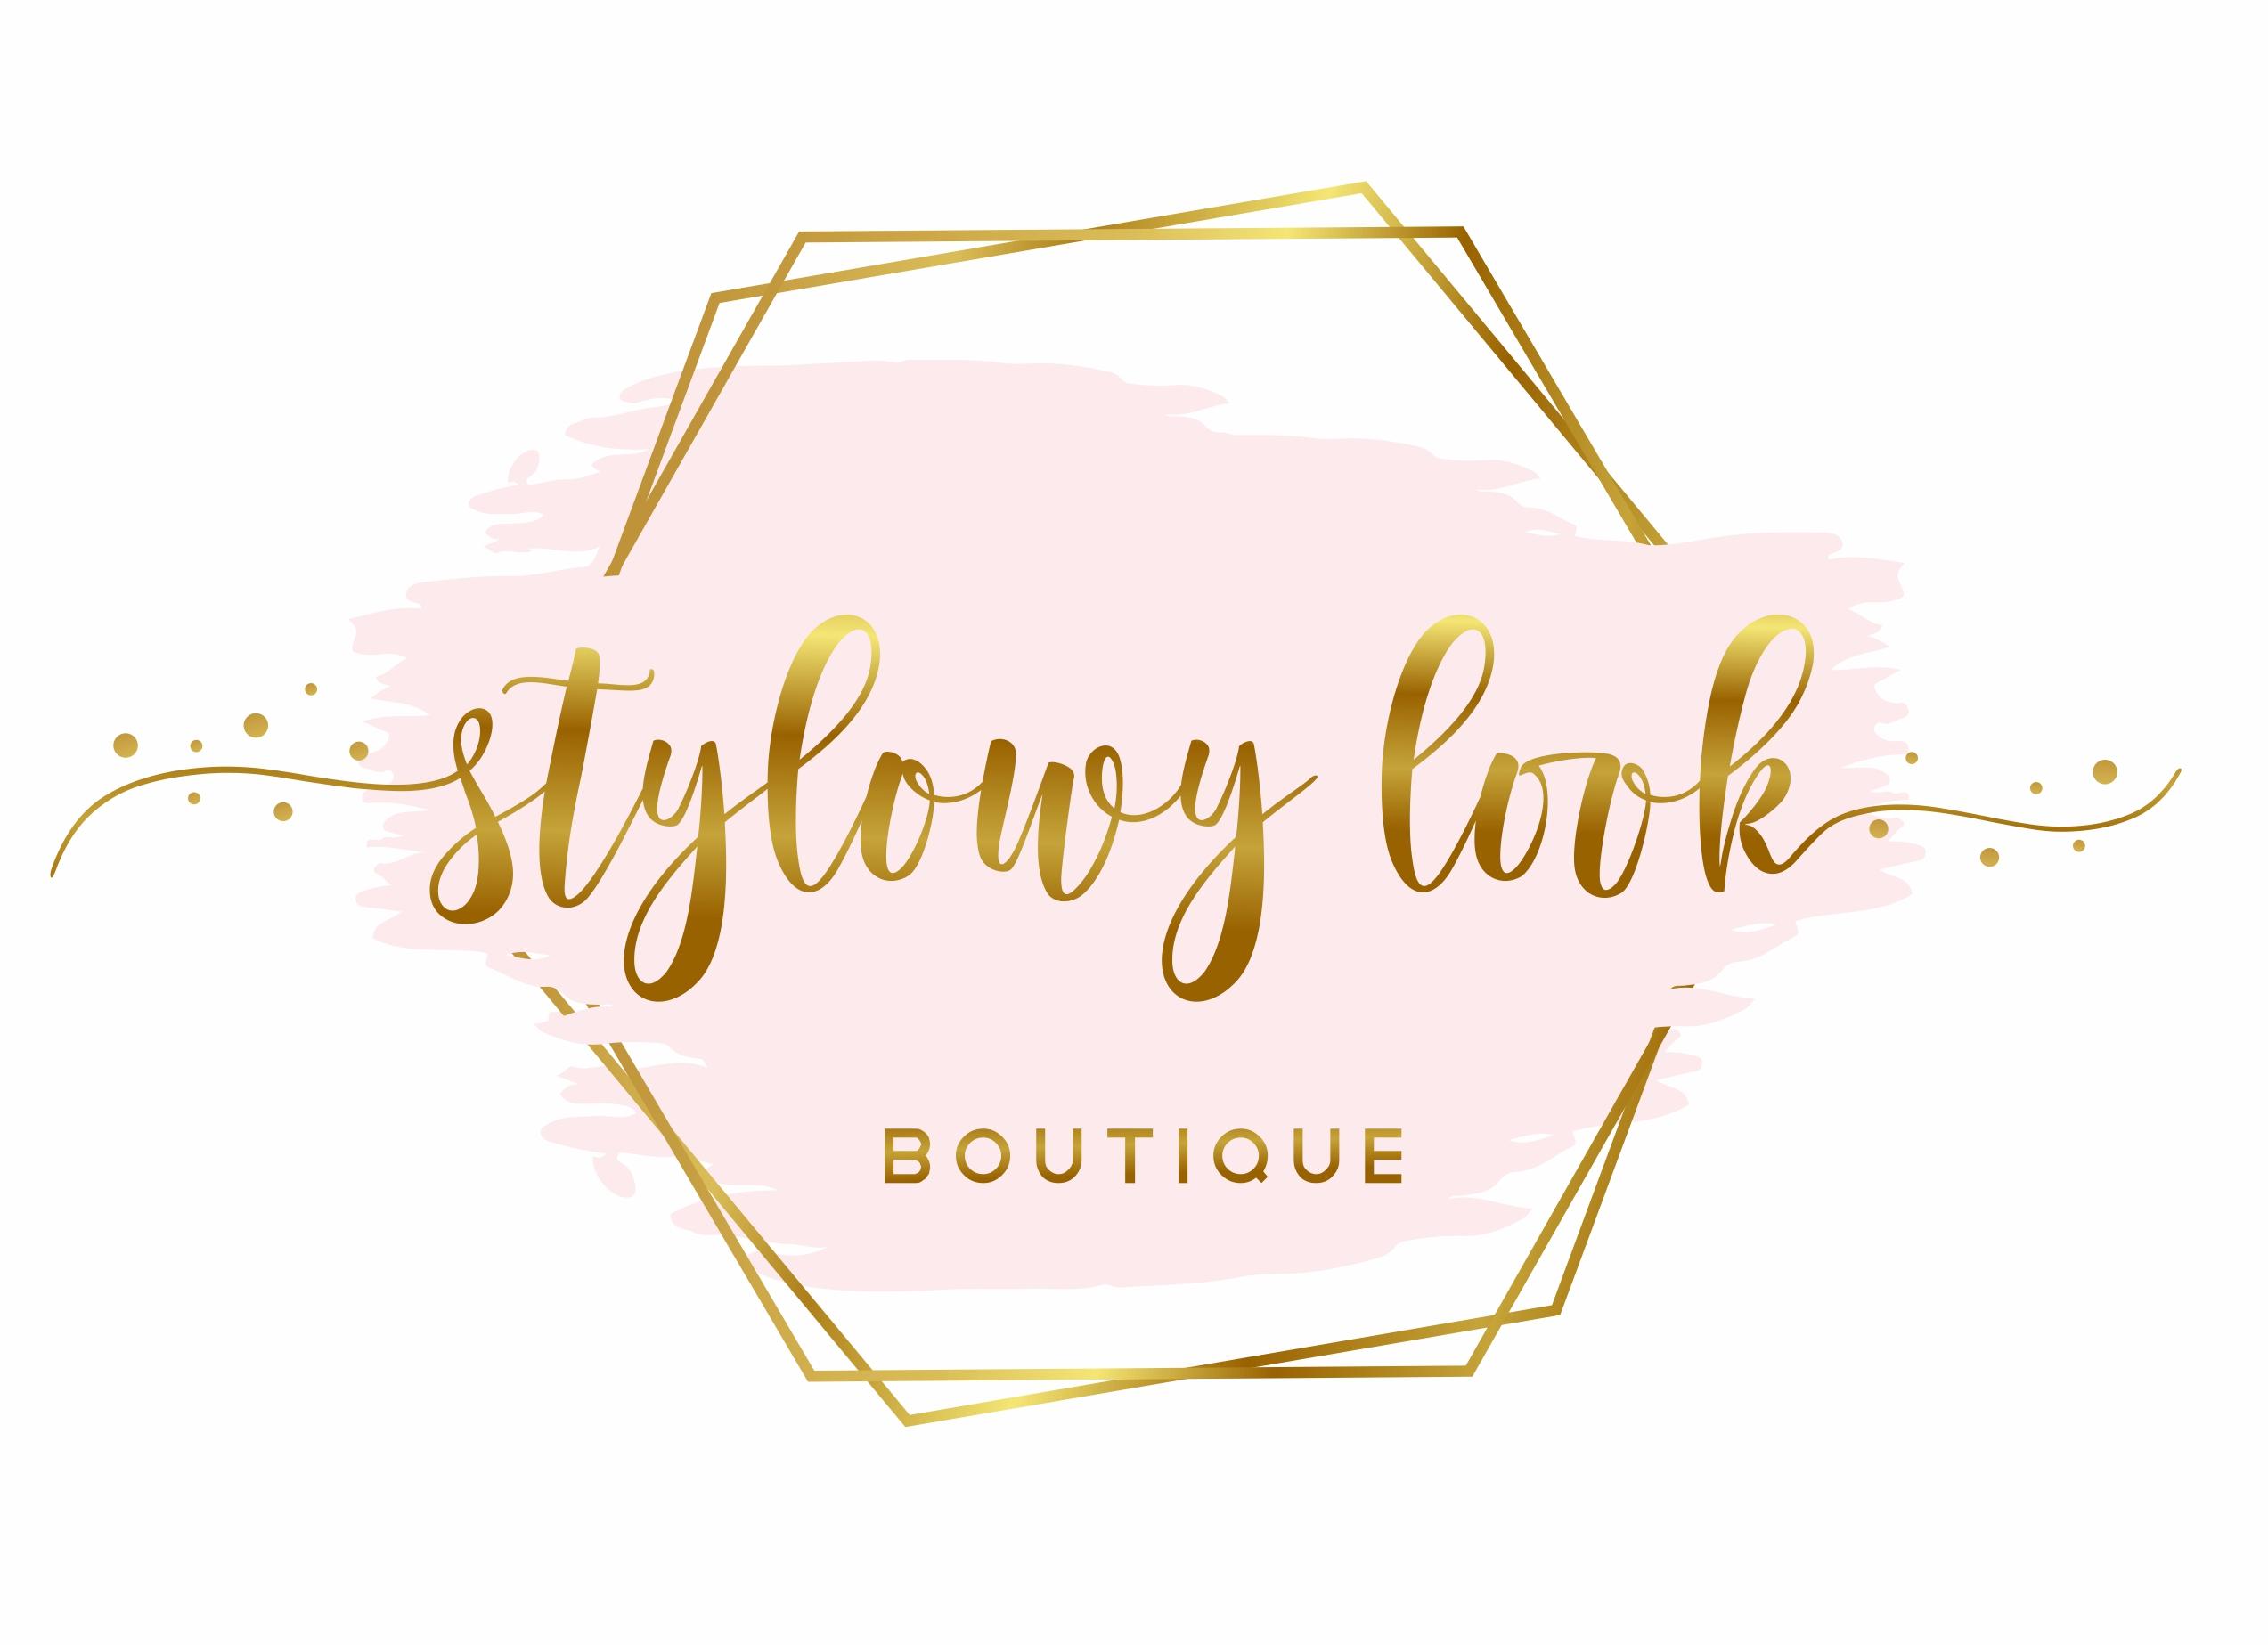 Logo dla Stylowy Look